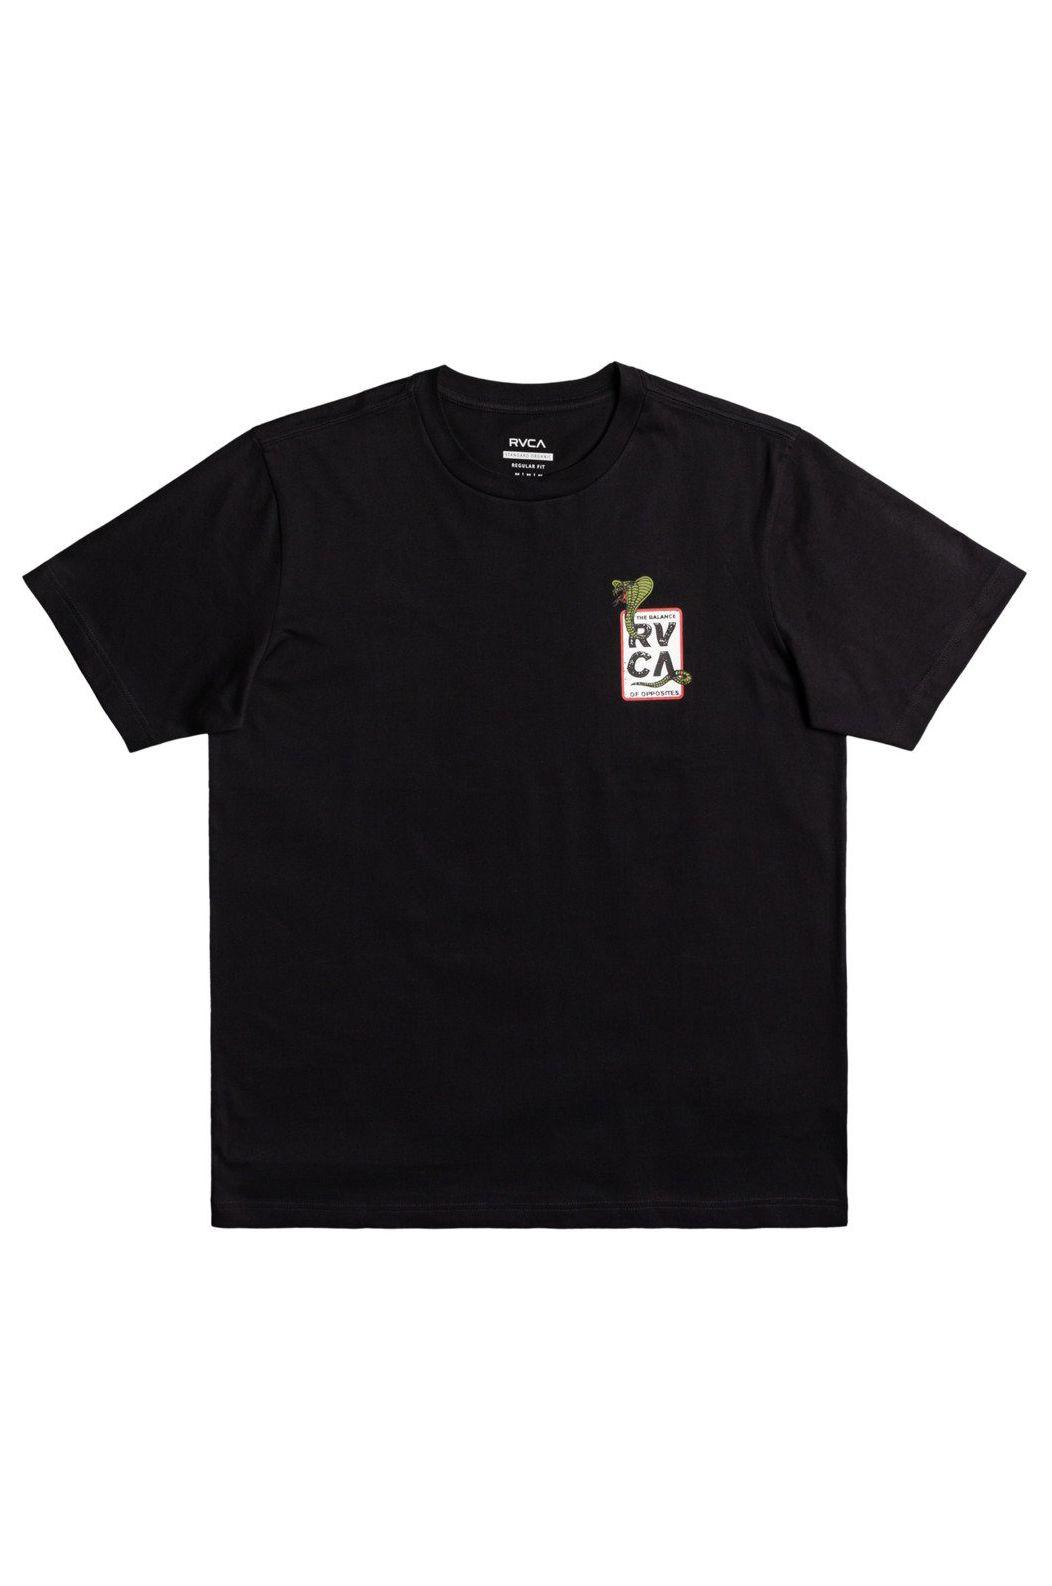 RVCA T-Shirt SNAKE EYES Black